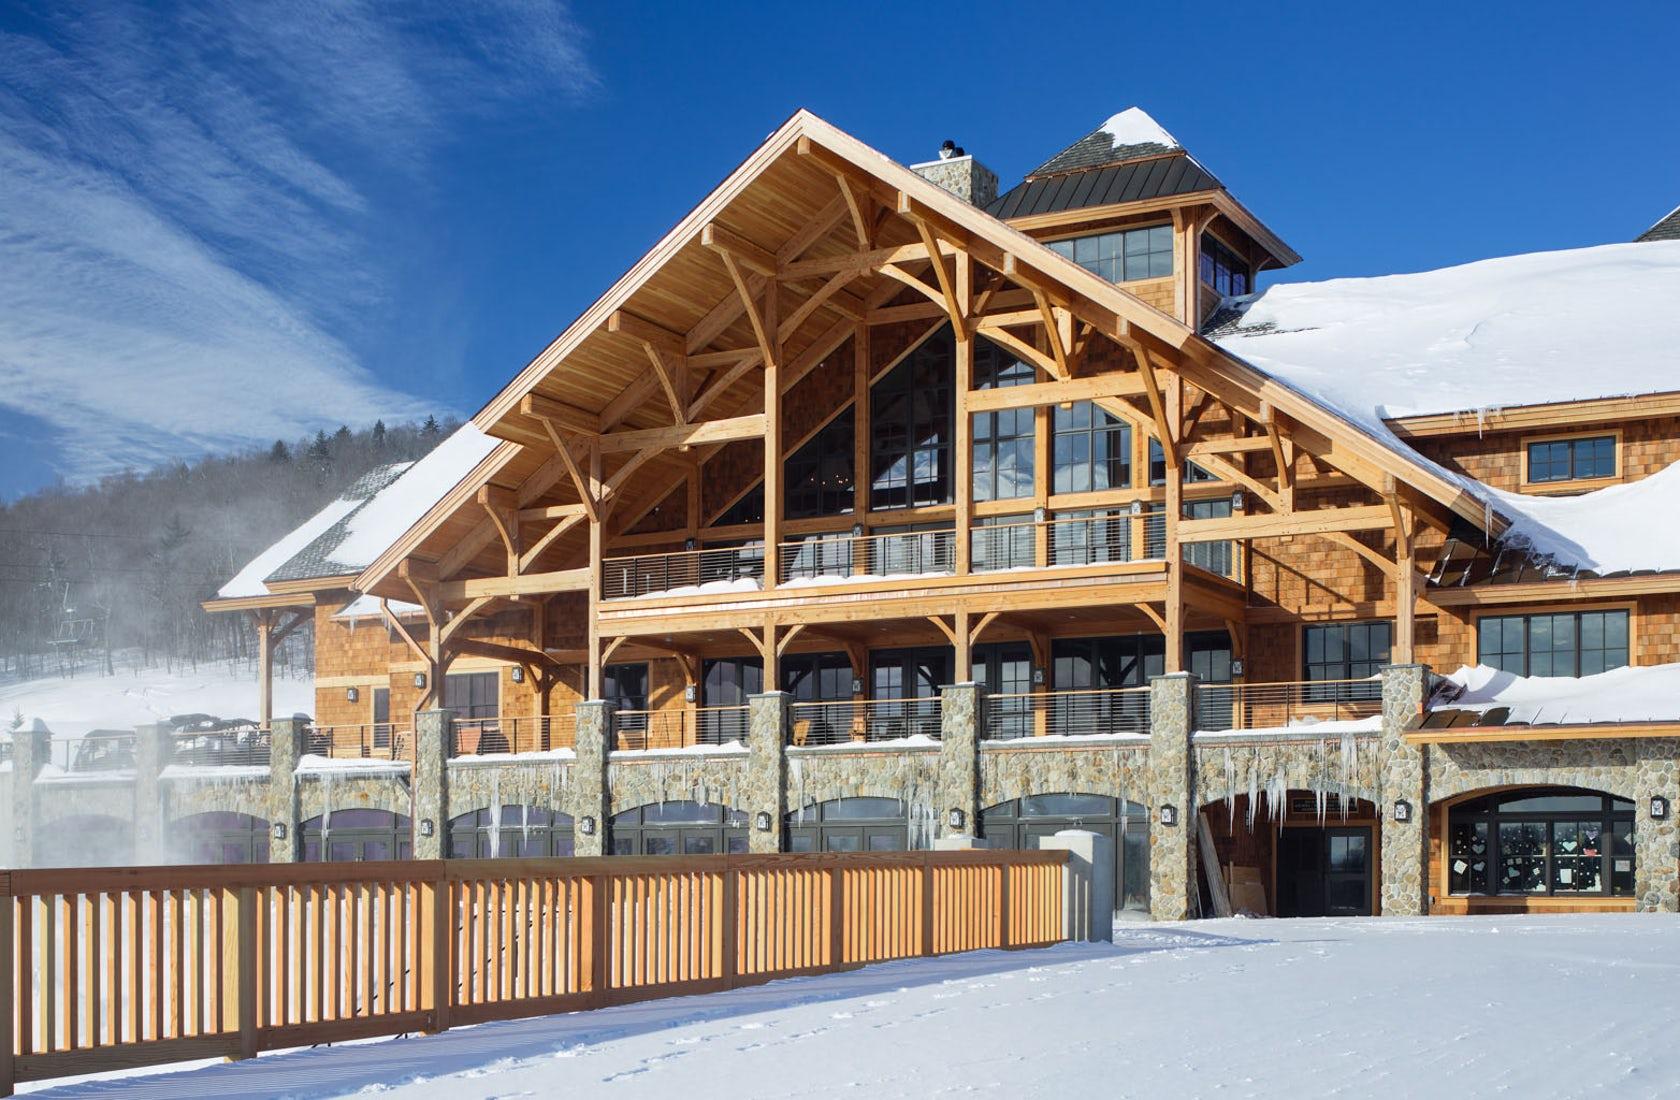 Foard-Panel-Hermitage-Club-Lodge-05.jpg